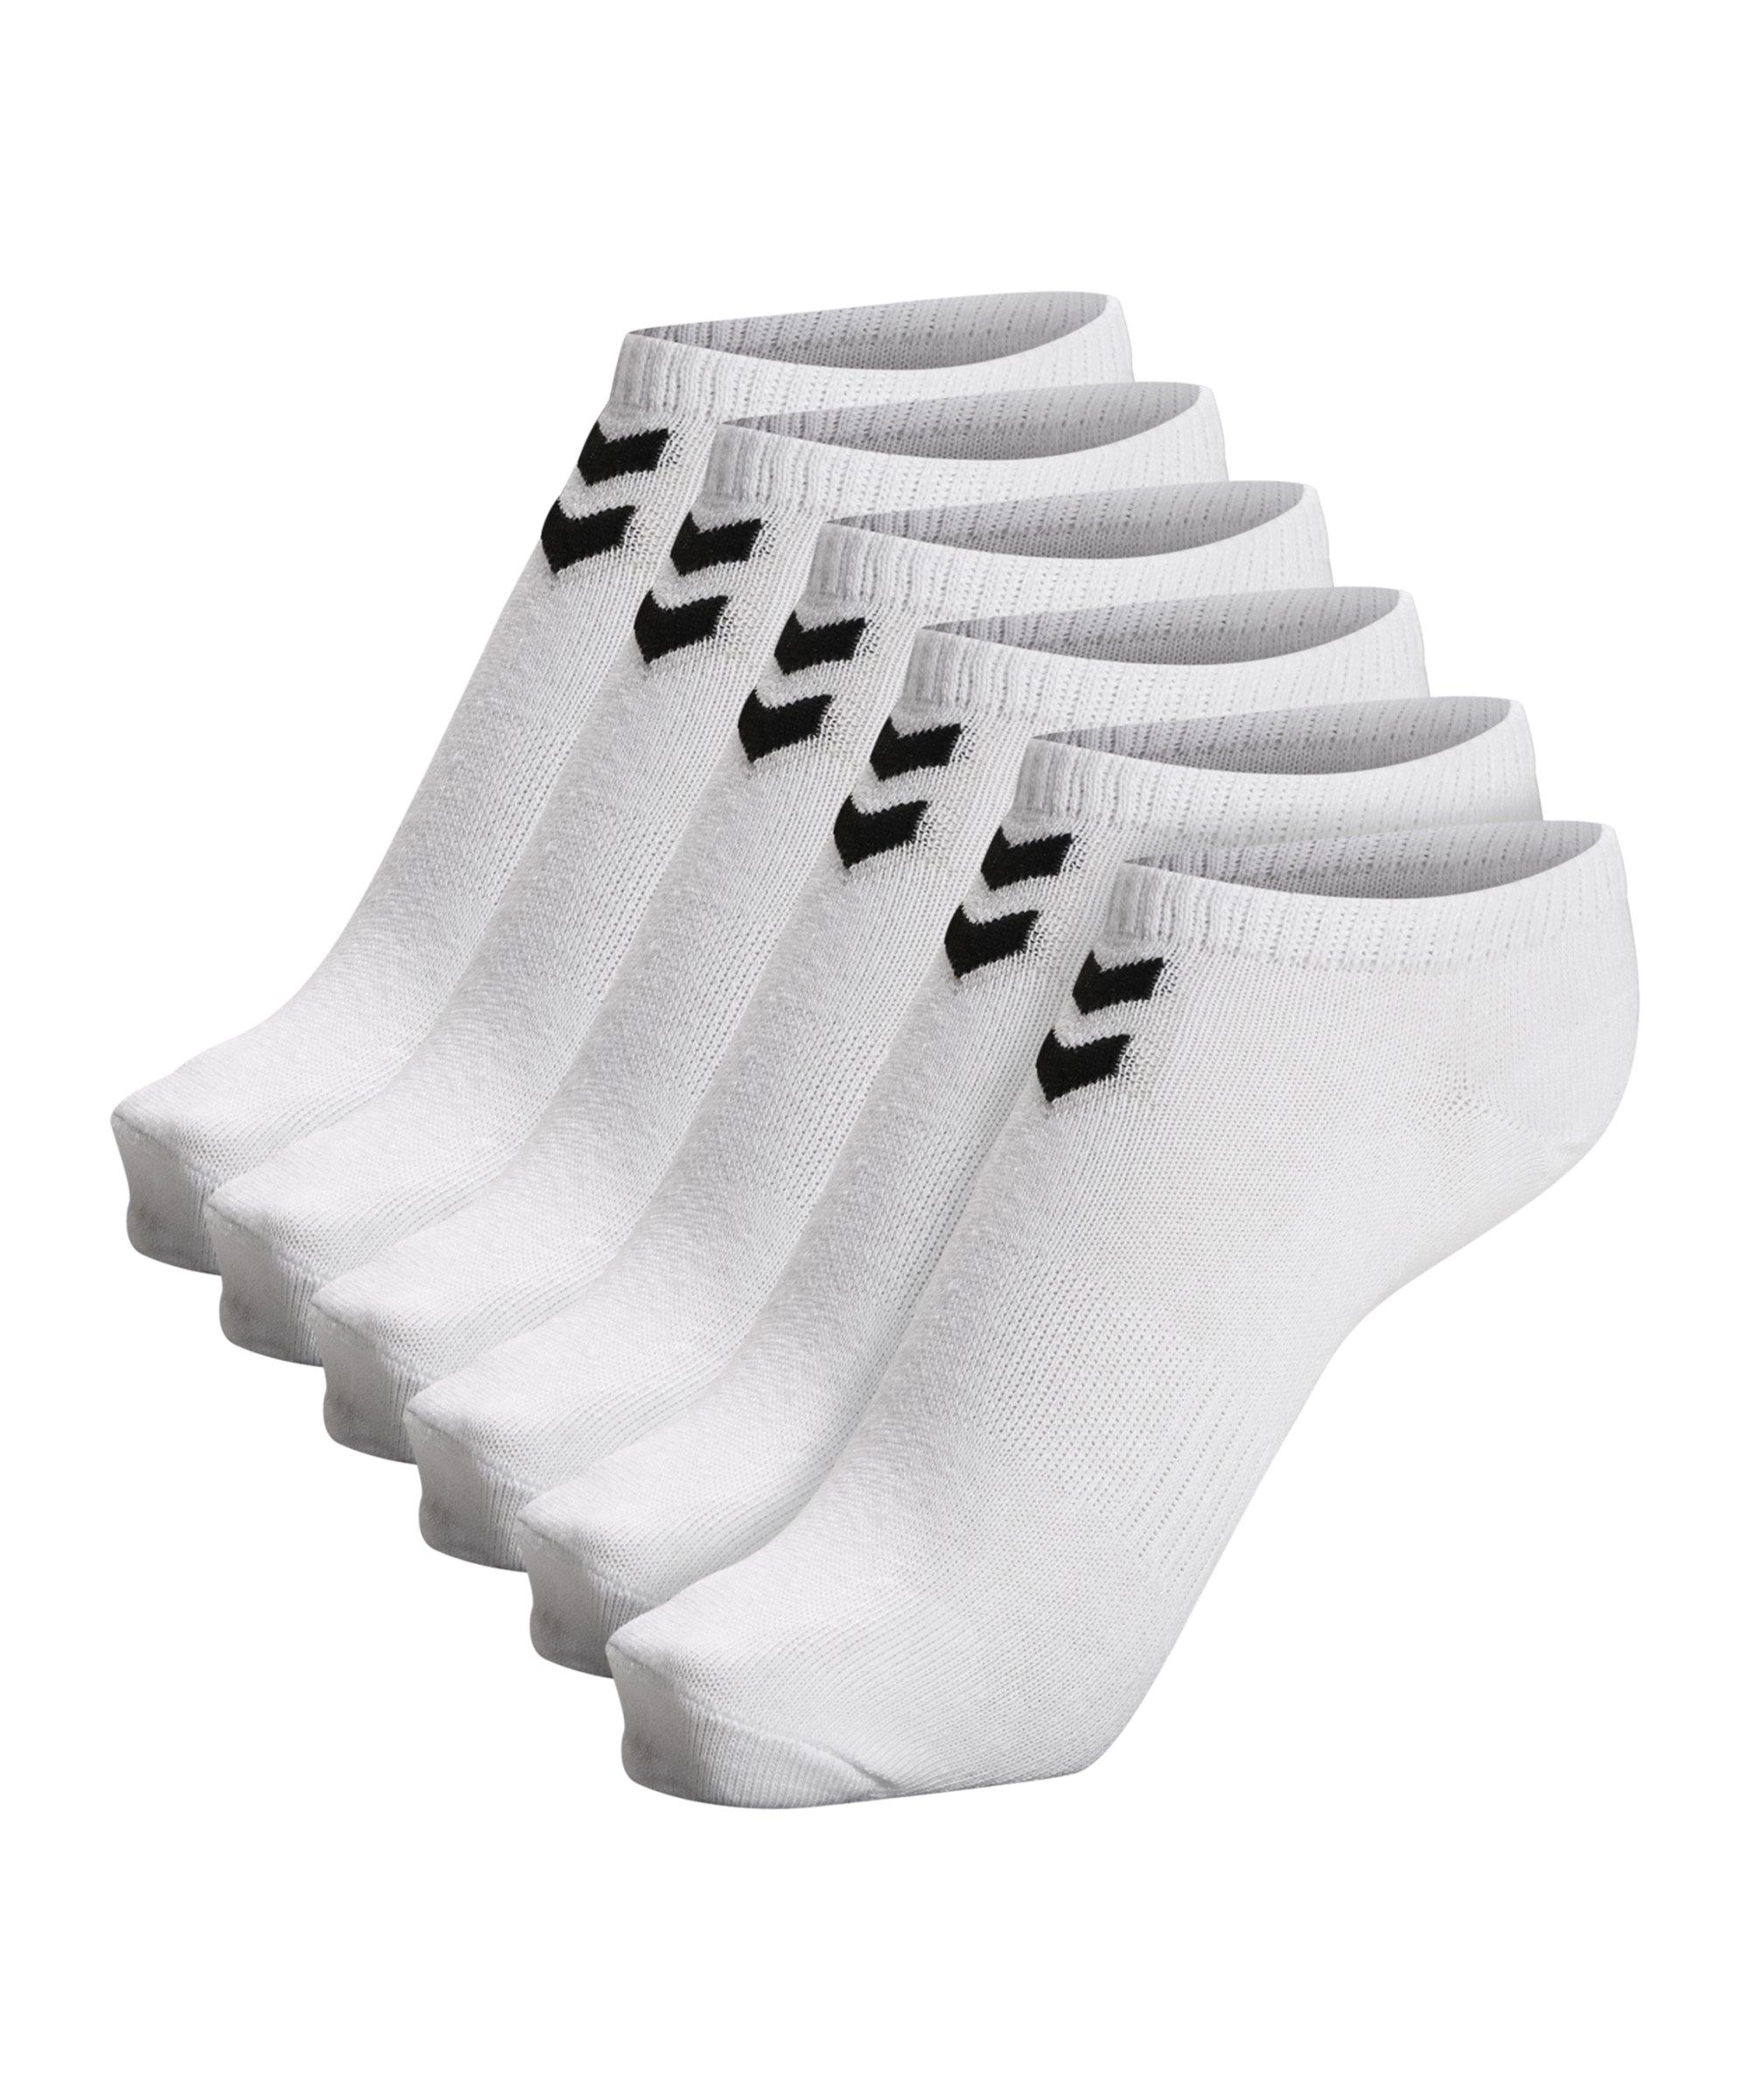 Hummel hmlchevron 6-Pack Ankle Socken F9001 - weiss